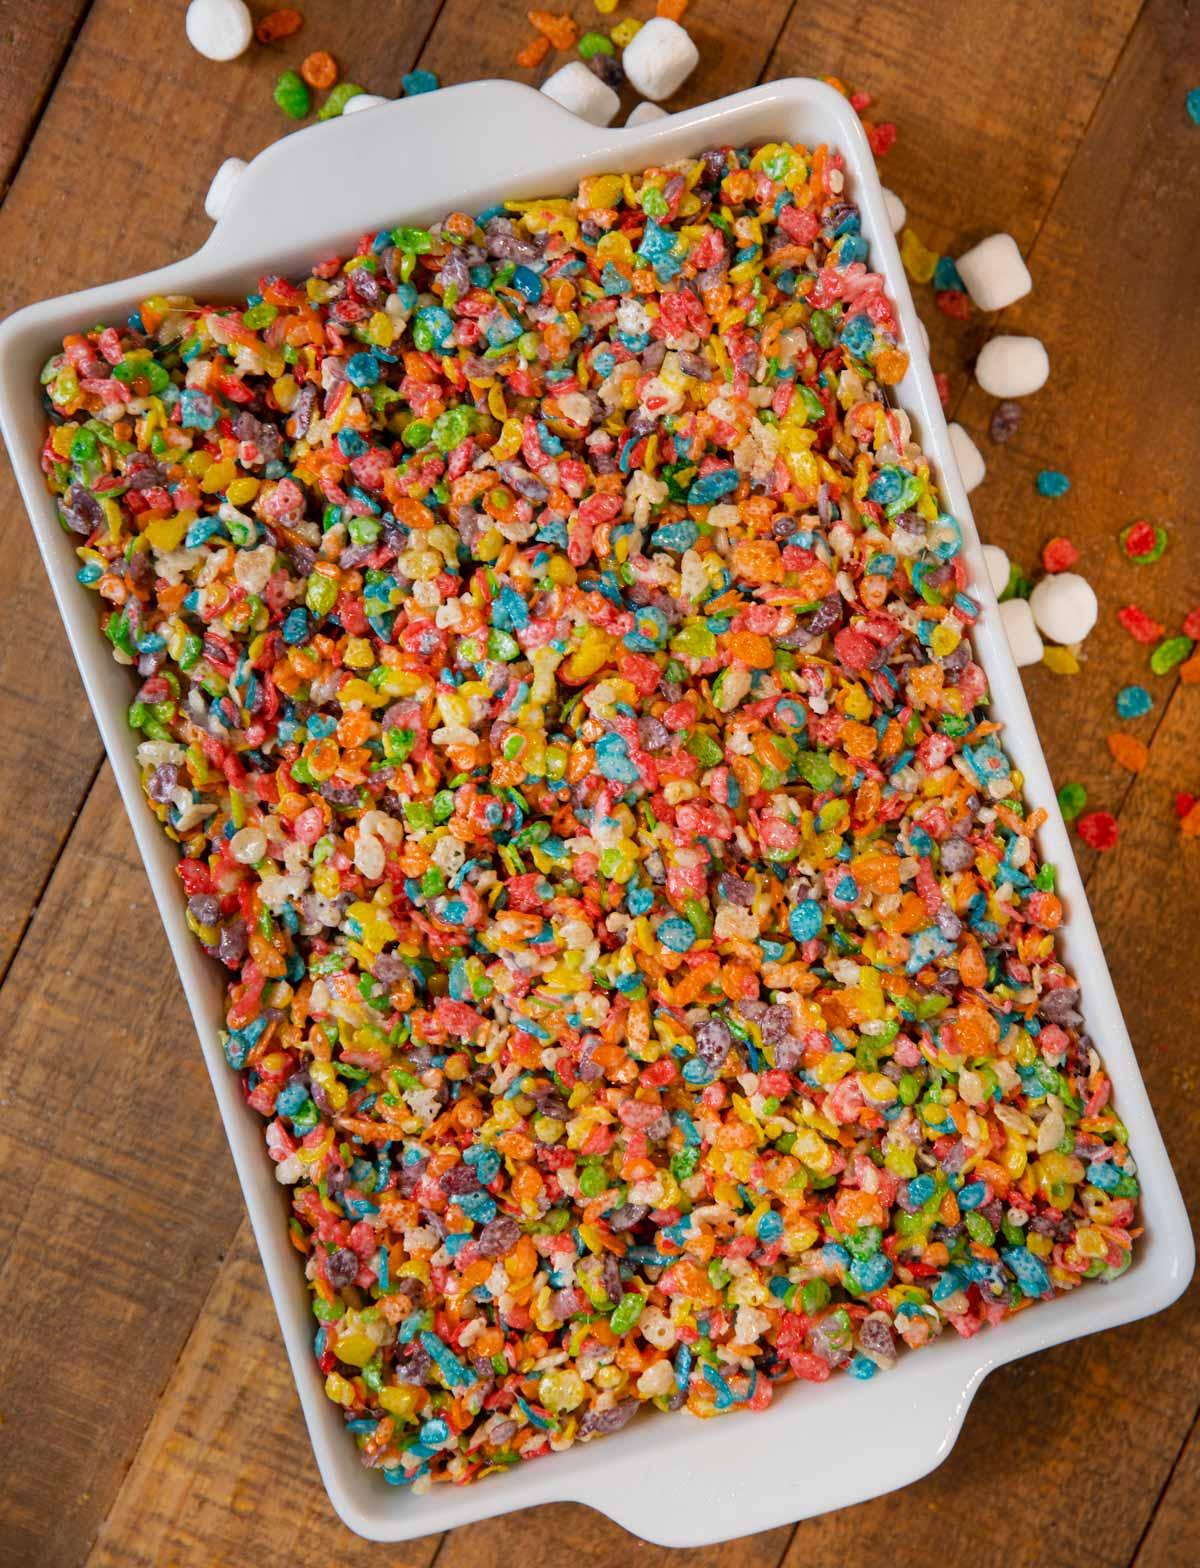 Fruity Pebbles Treats in cake pan